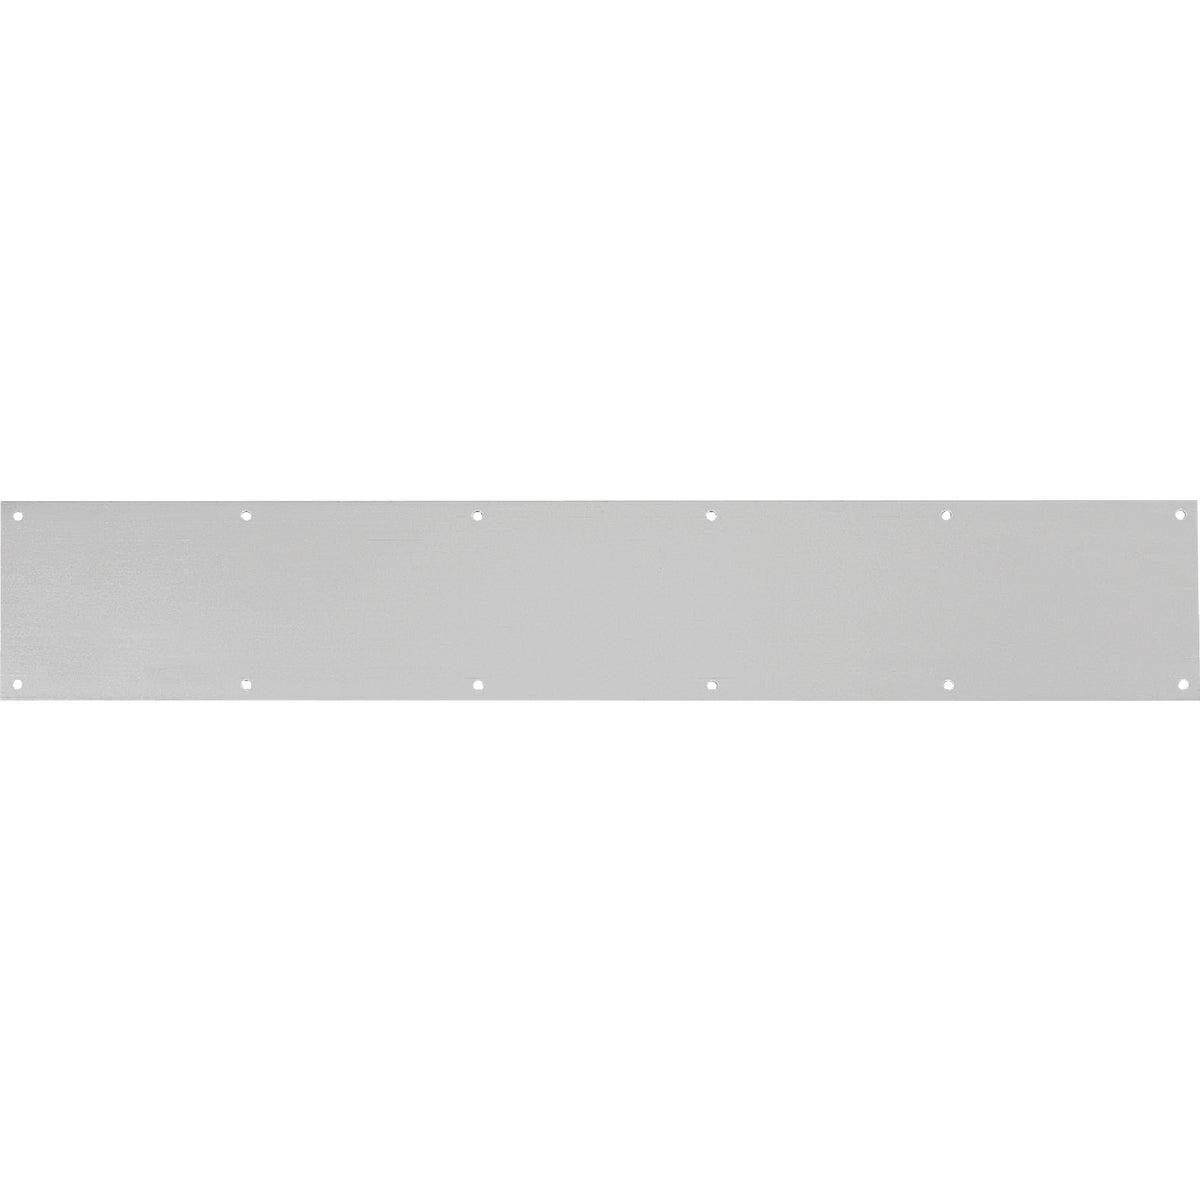 Tell Mfg. Inc. 6 X 34 28 CS KICK PLATE DT100056